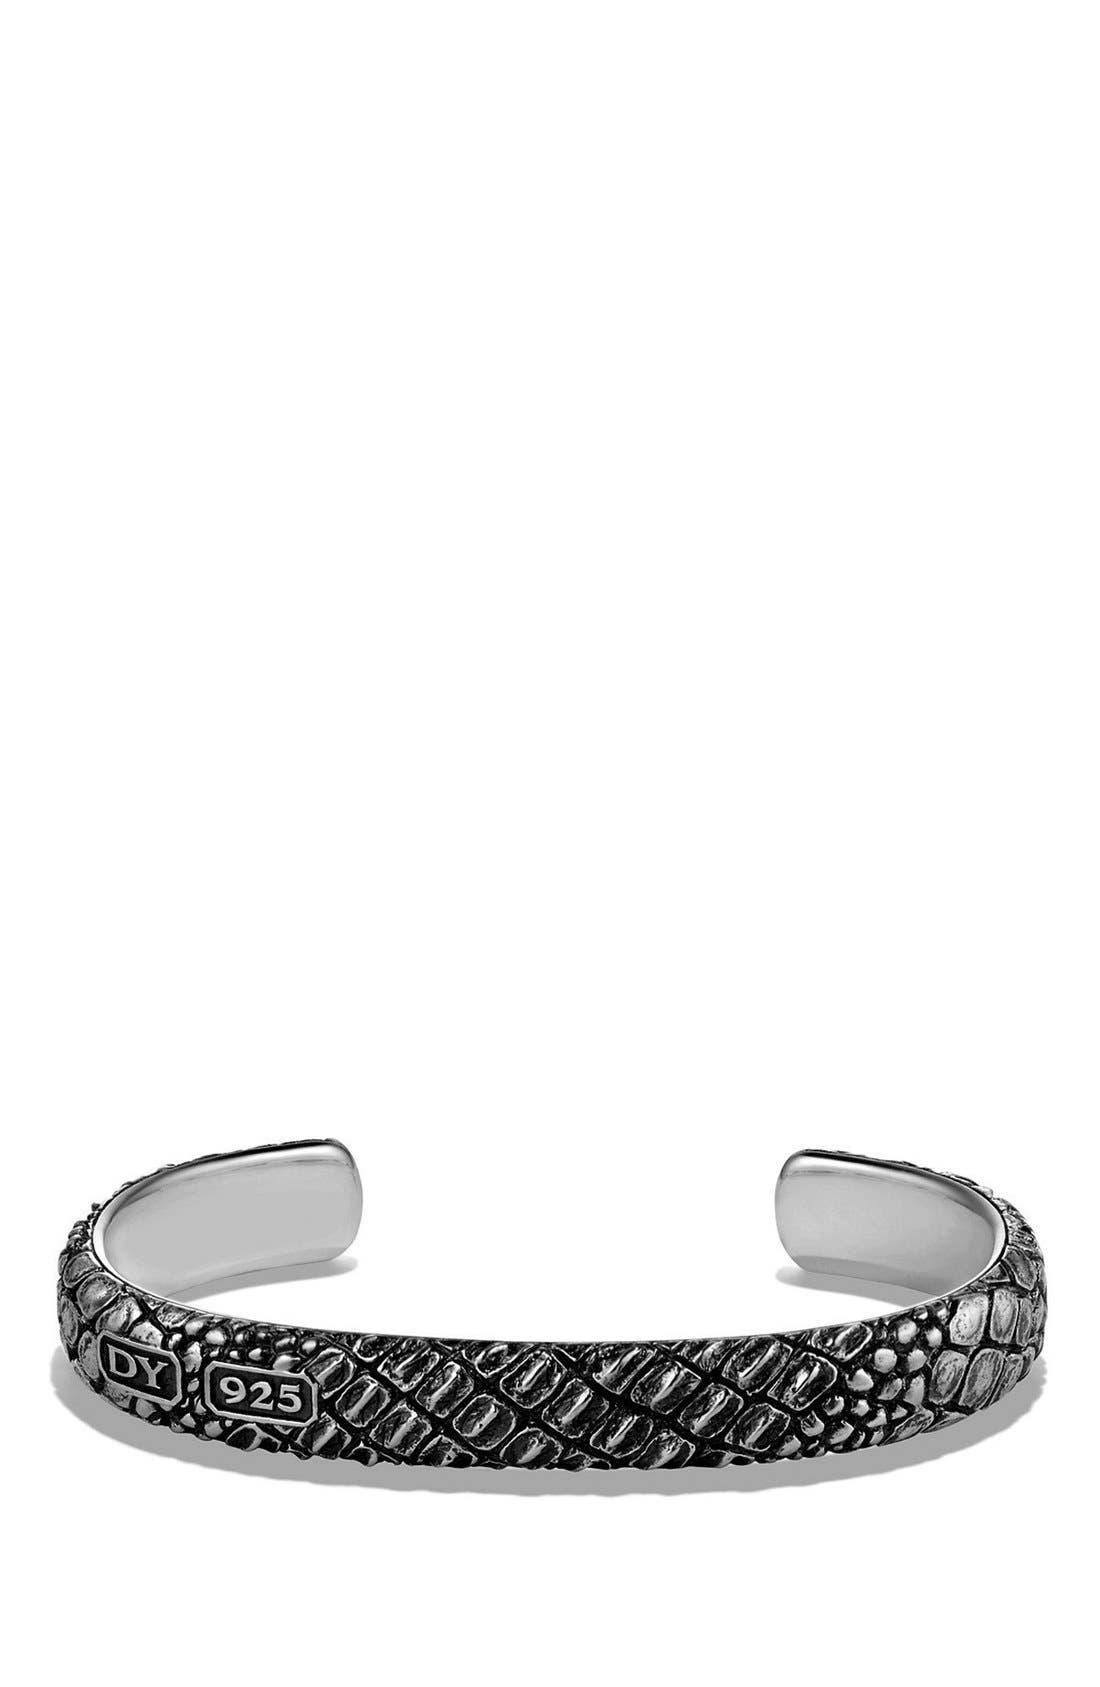 'Naturals' Gator Cuff Bracelet,                         Main,                         color, SILVER